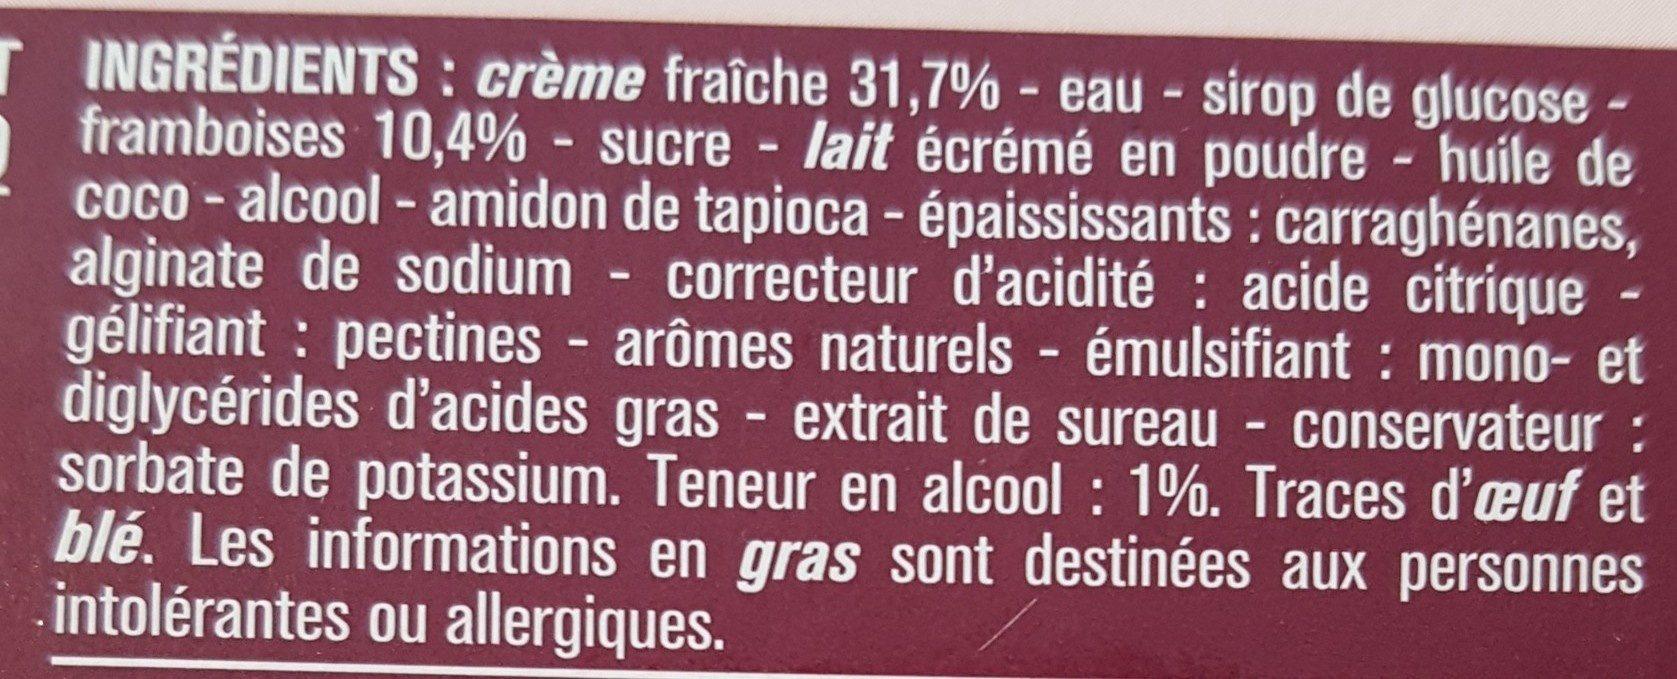 Panna Cotta coulis framboise - Ingredients - fr